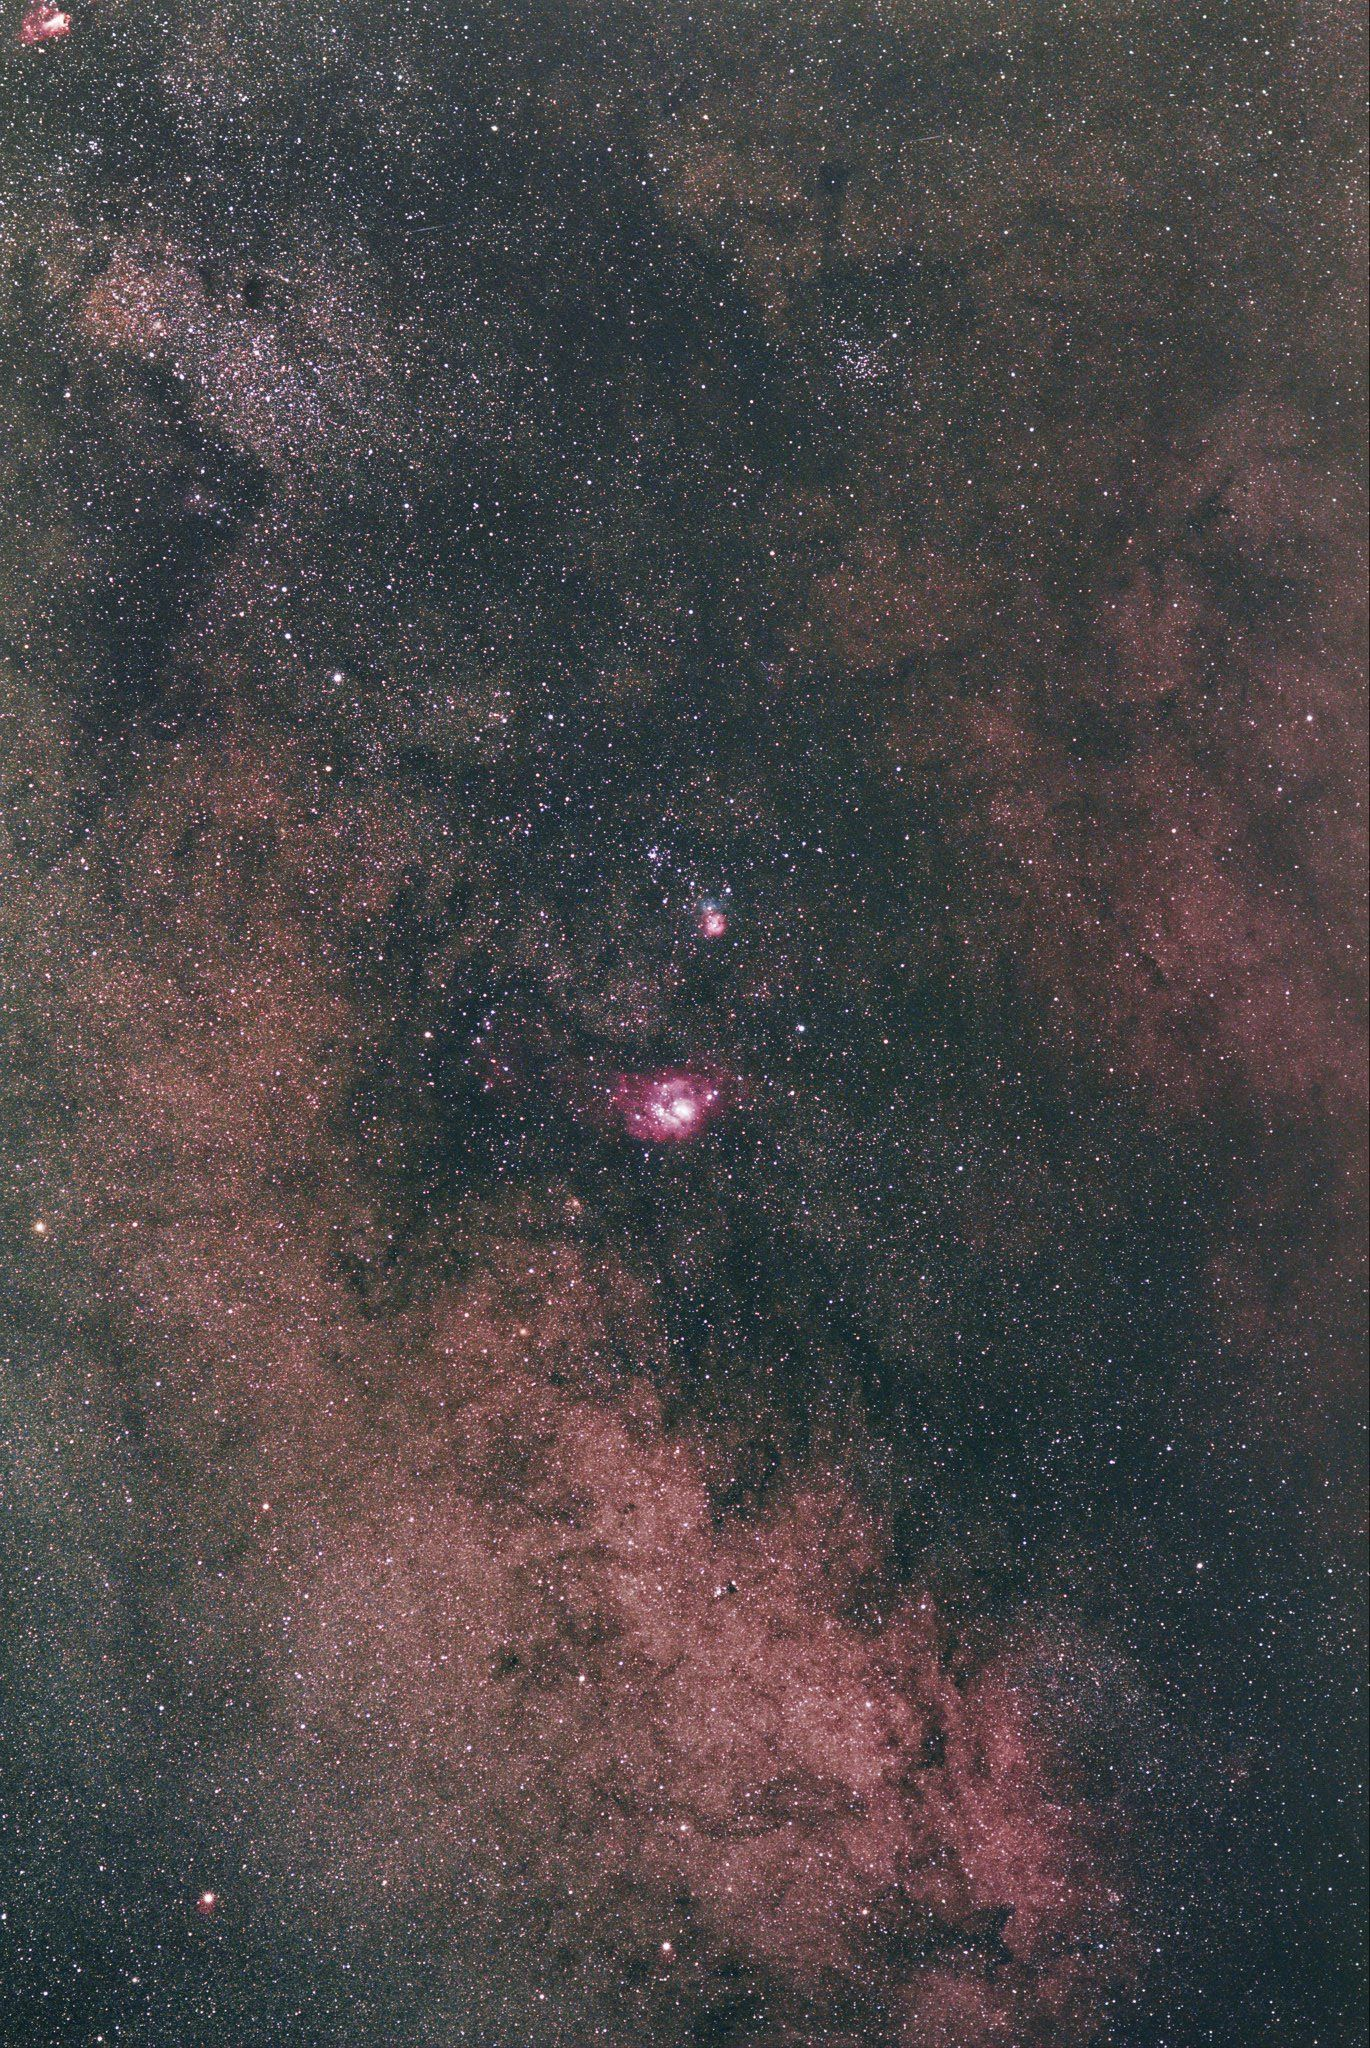 星途9-85mm探索深空天體(DSO)- 2014 July- August